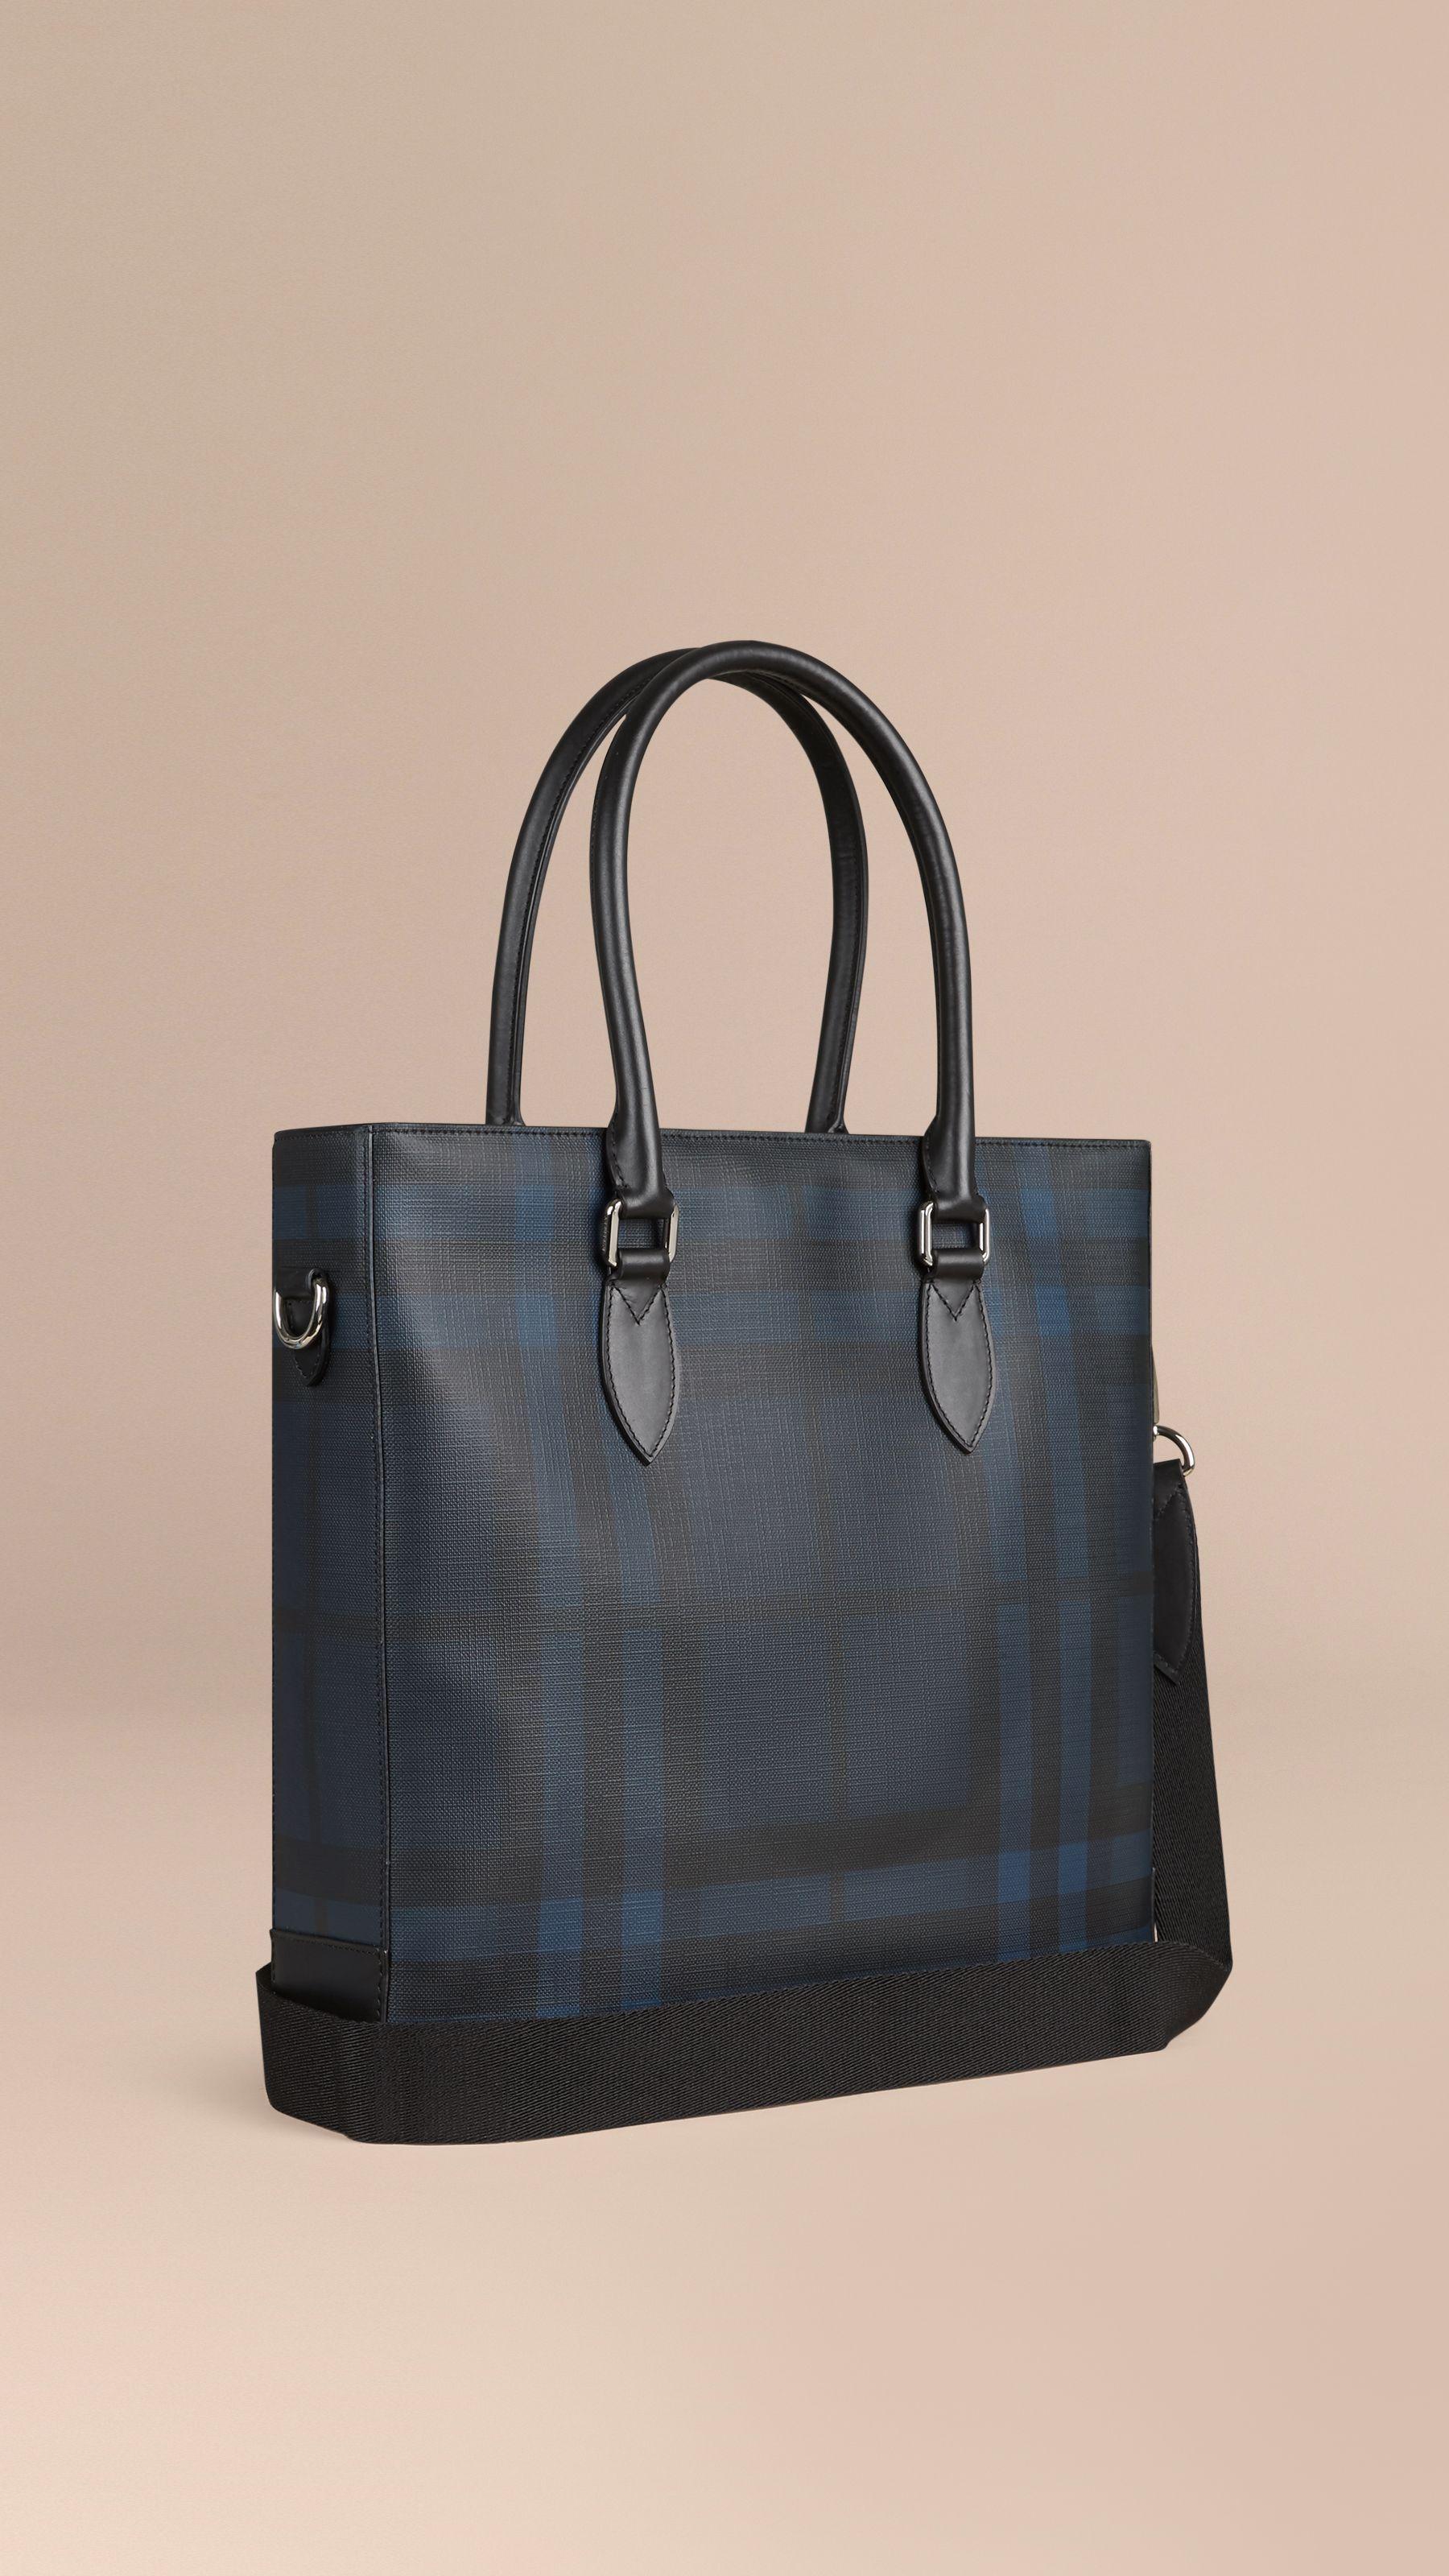 87ec7829d22d London Check Tote Bag in Navy black - Men